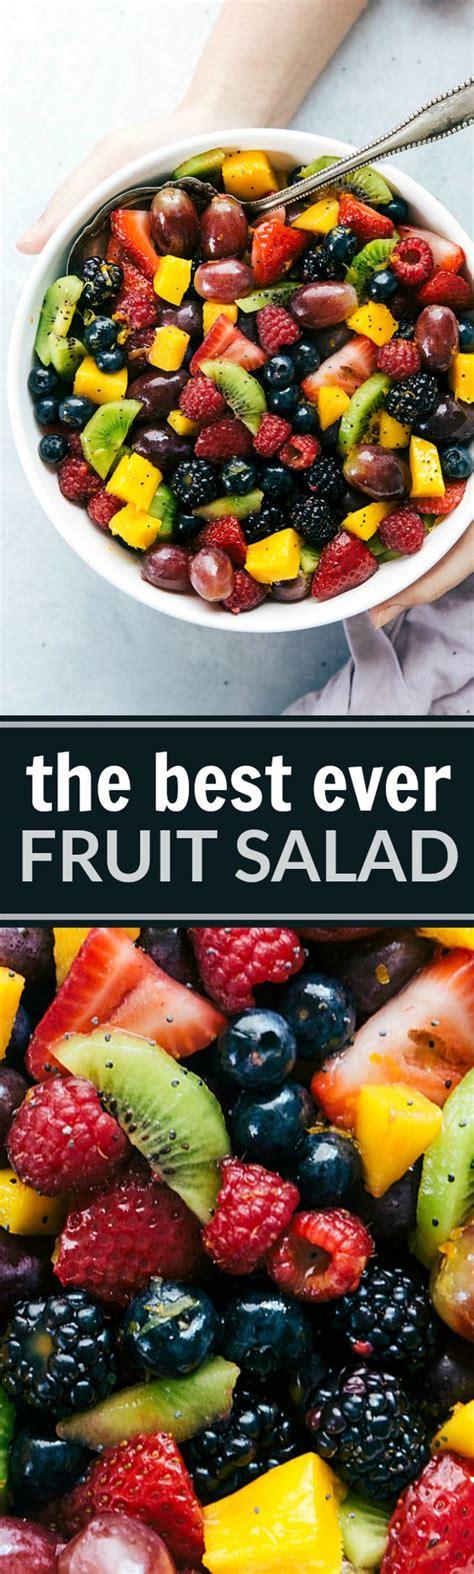 50 best fruit salad recipes 50 best thanksgiving vegetable side dishes 2017